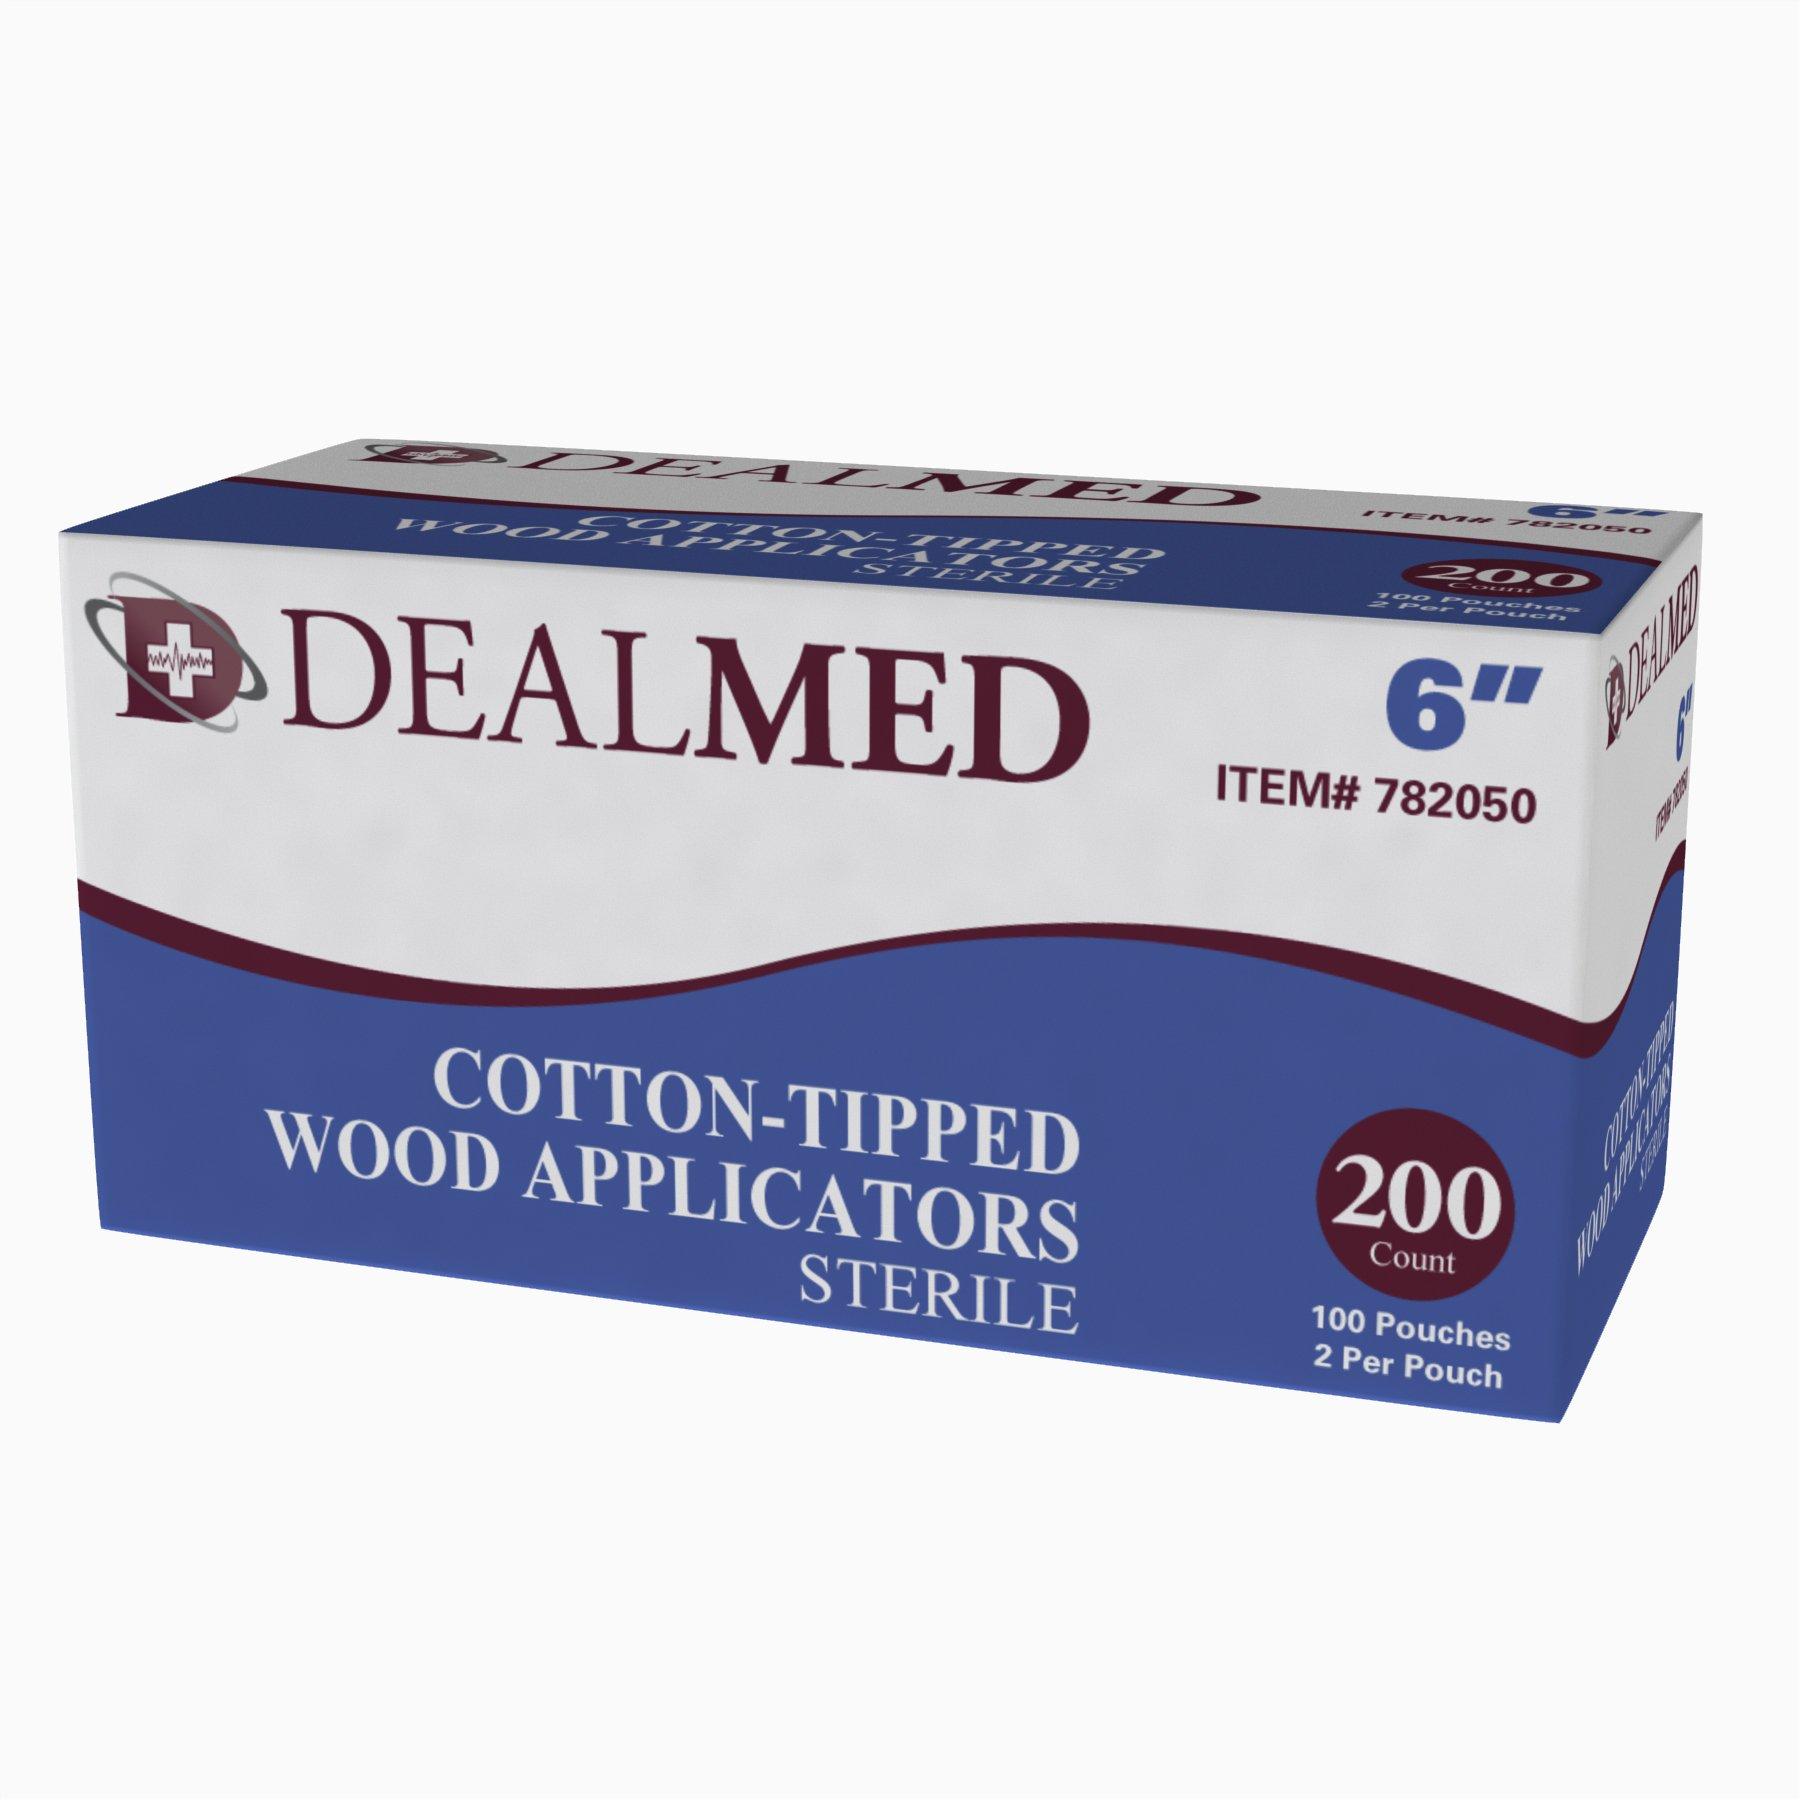 Dealmed 6'' Sterile Cotton-Tipped Wood Applicators, 2 per Pouch, 100 Pouches (200 Count)